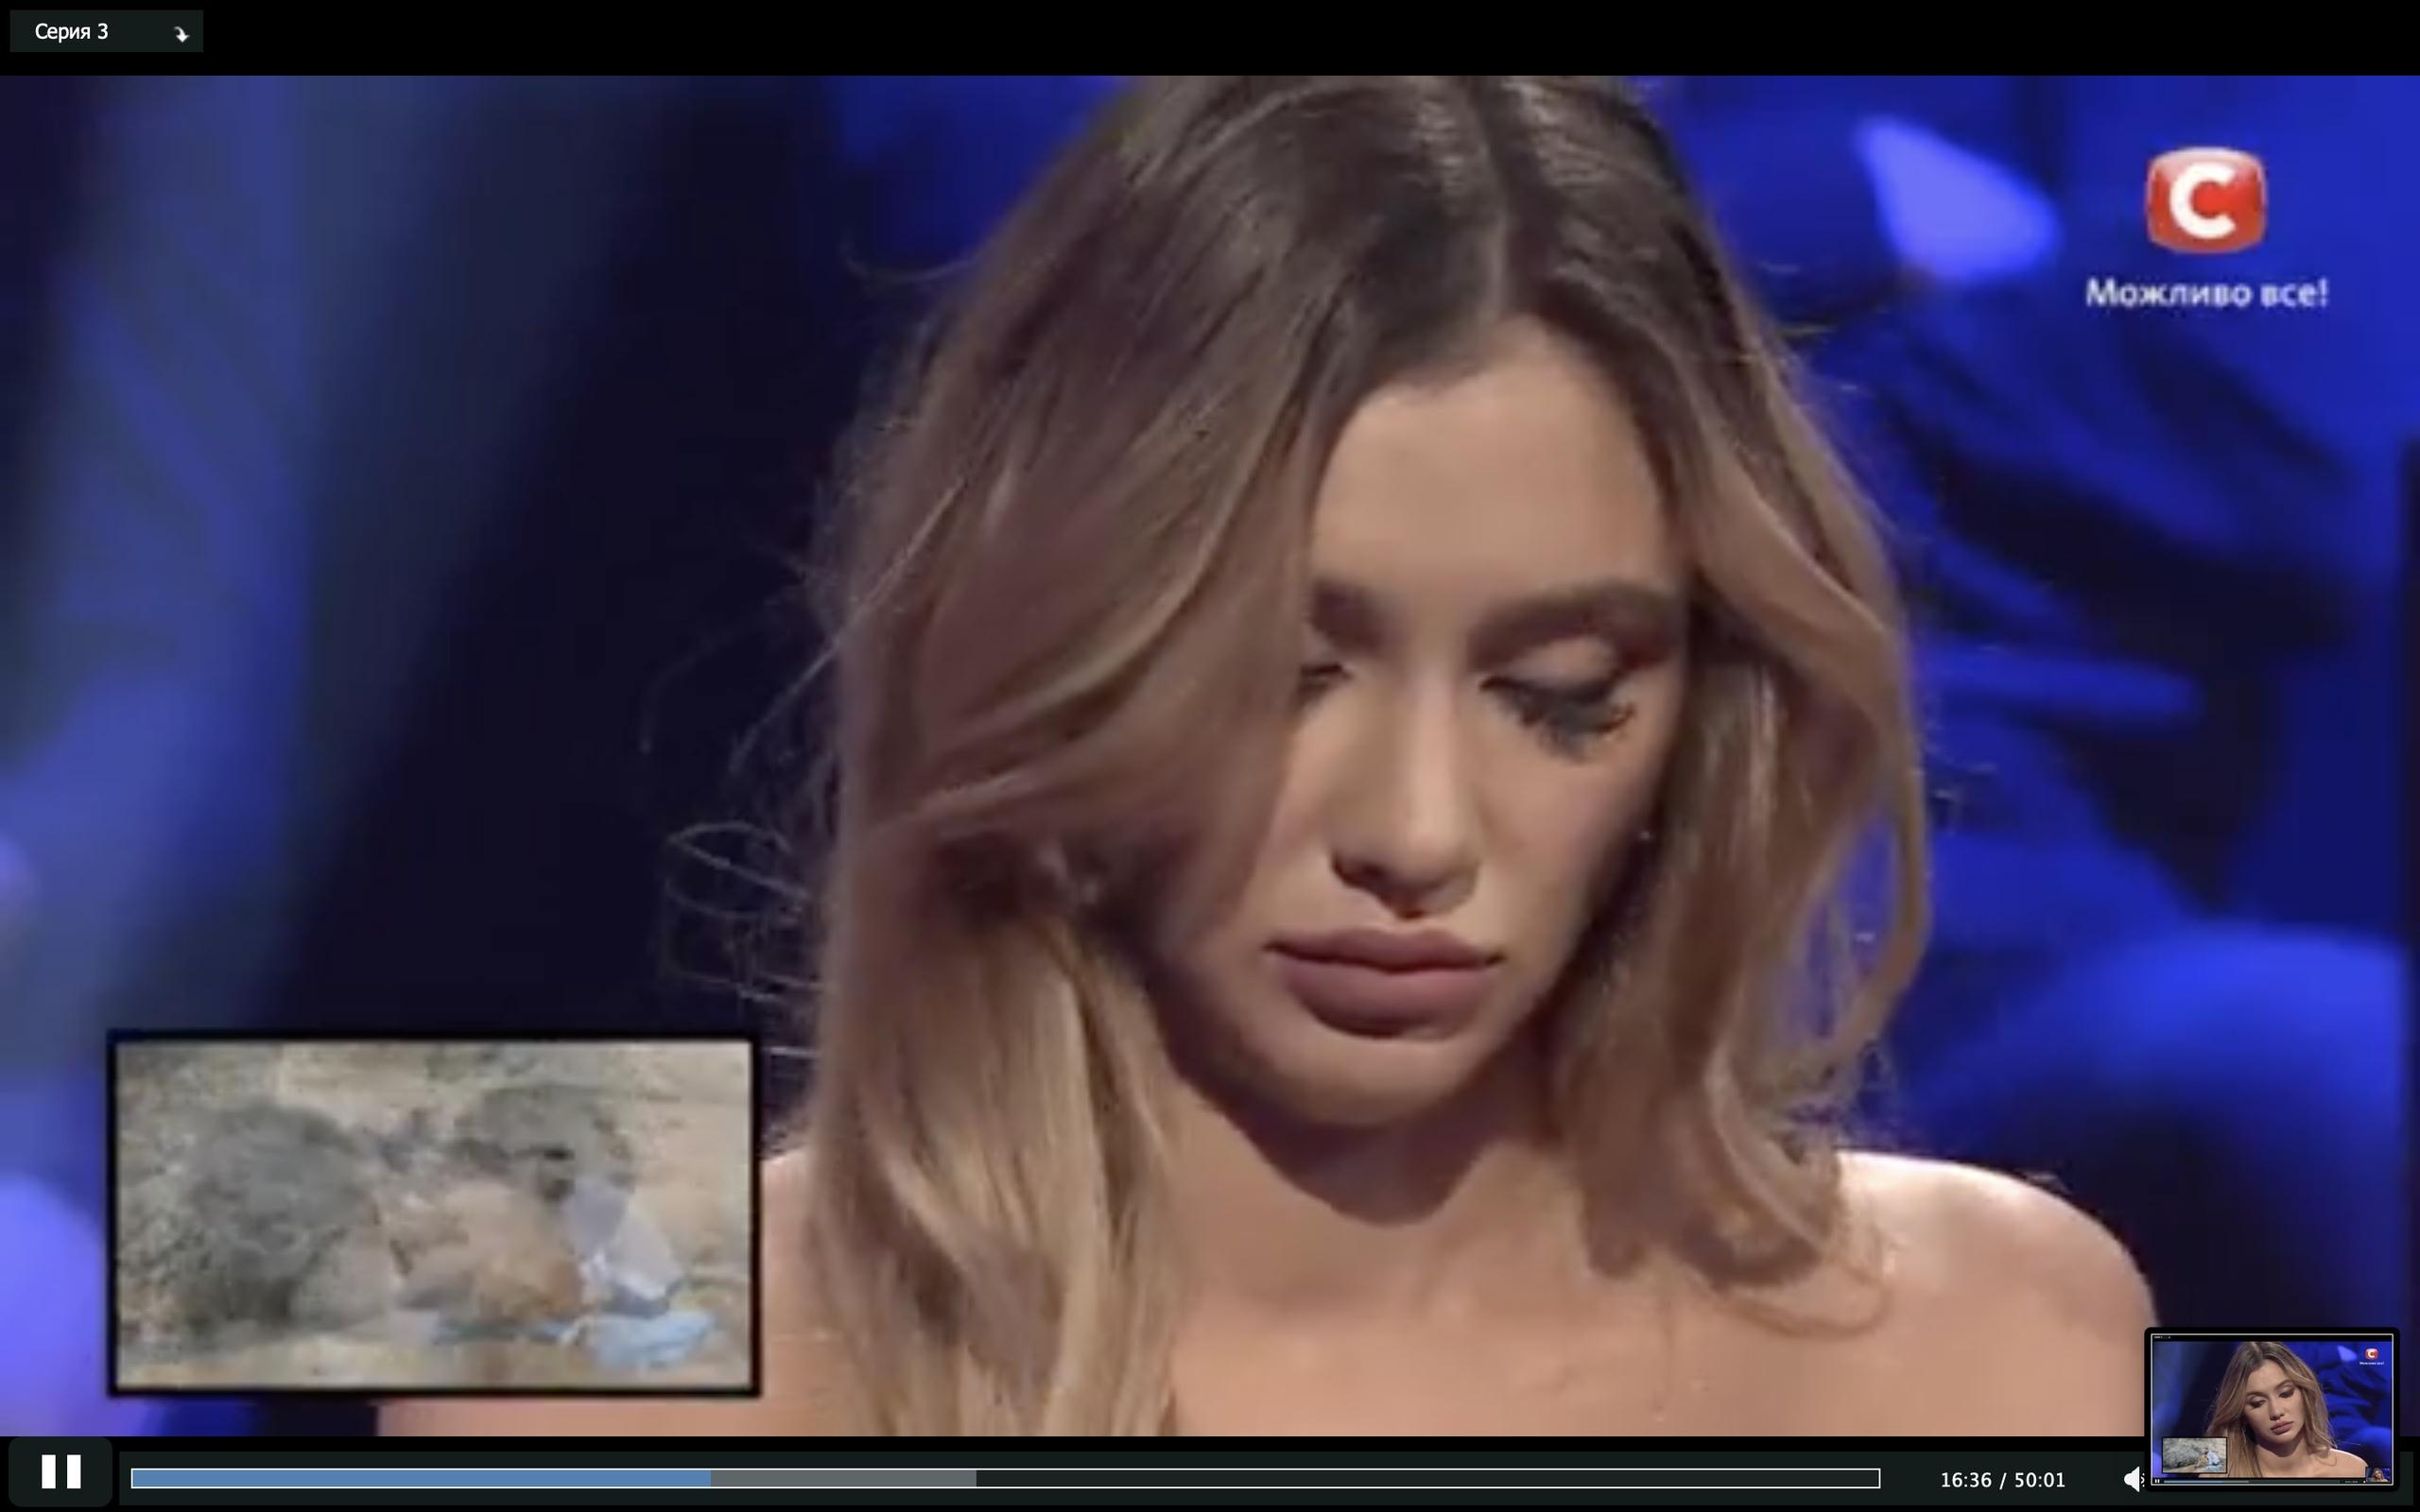 Bachelor Ukraine - Season 9 - Nikita Dobrynin - *Sleuthing Spoilers* - Page 14 TBt0Rp54EKM